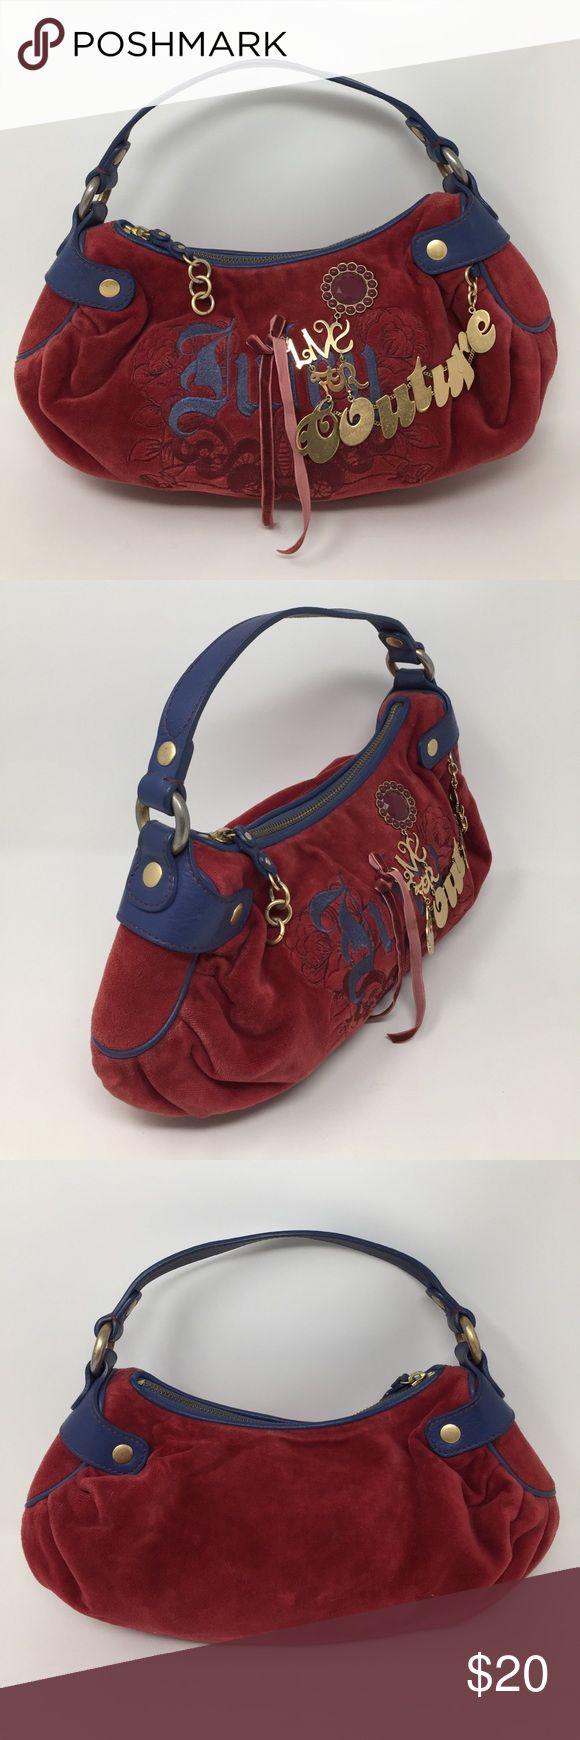 Vintage Juicy Couture Hobo Shoulder Bag 100% Authentic Juicy Couture, Vintage. Please see pictures for details. Bundle and save! Juicy Couture Bags Hobos